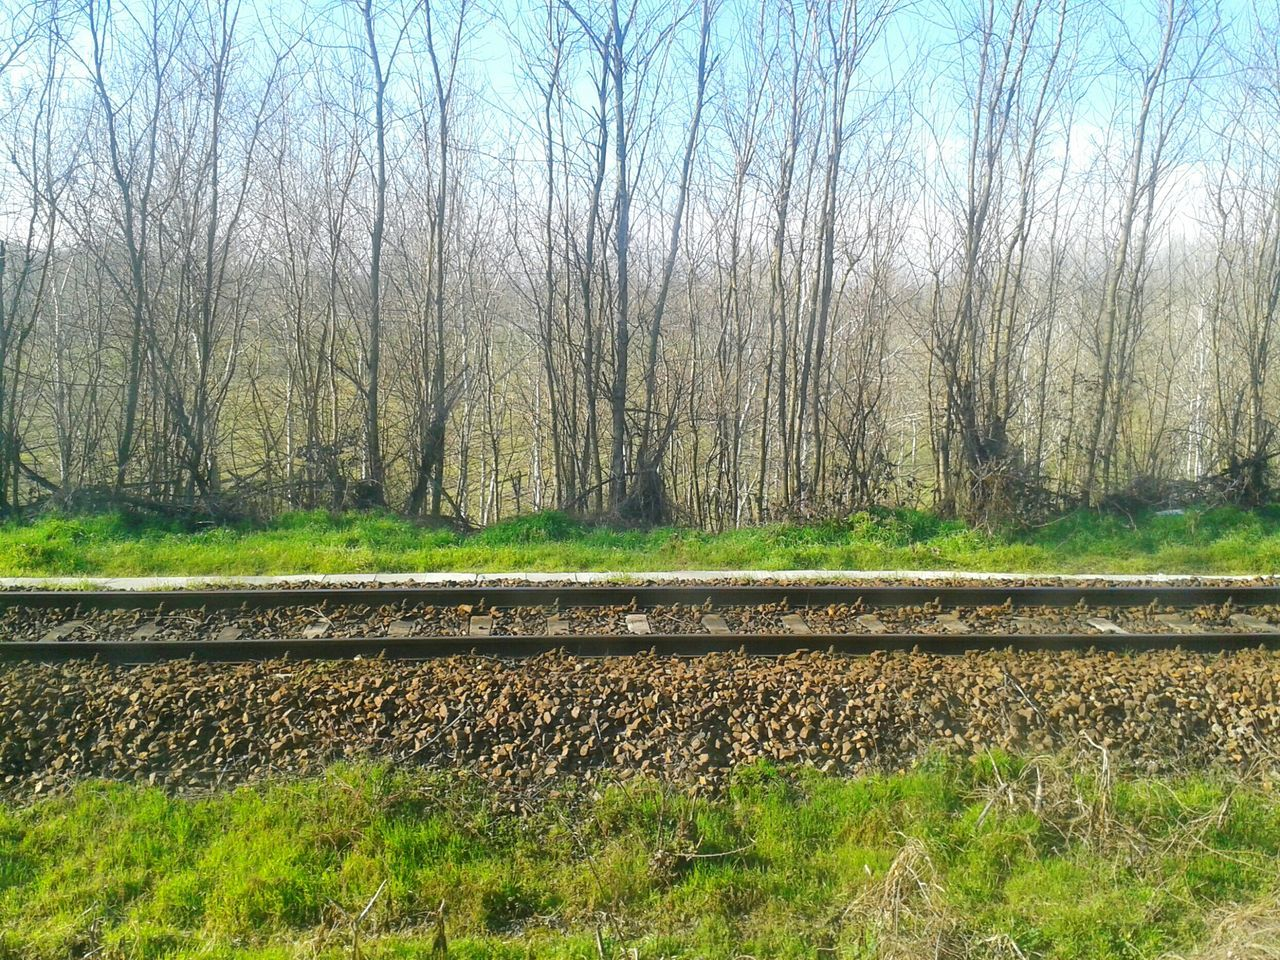 """ From The Train Window . 1"". Pianurapadana Sunny Afternoon Trees Railway Track Mobile Photography S3mini Eyeemfilter F3 lev 5"